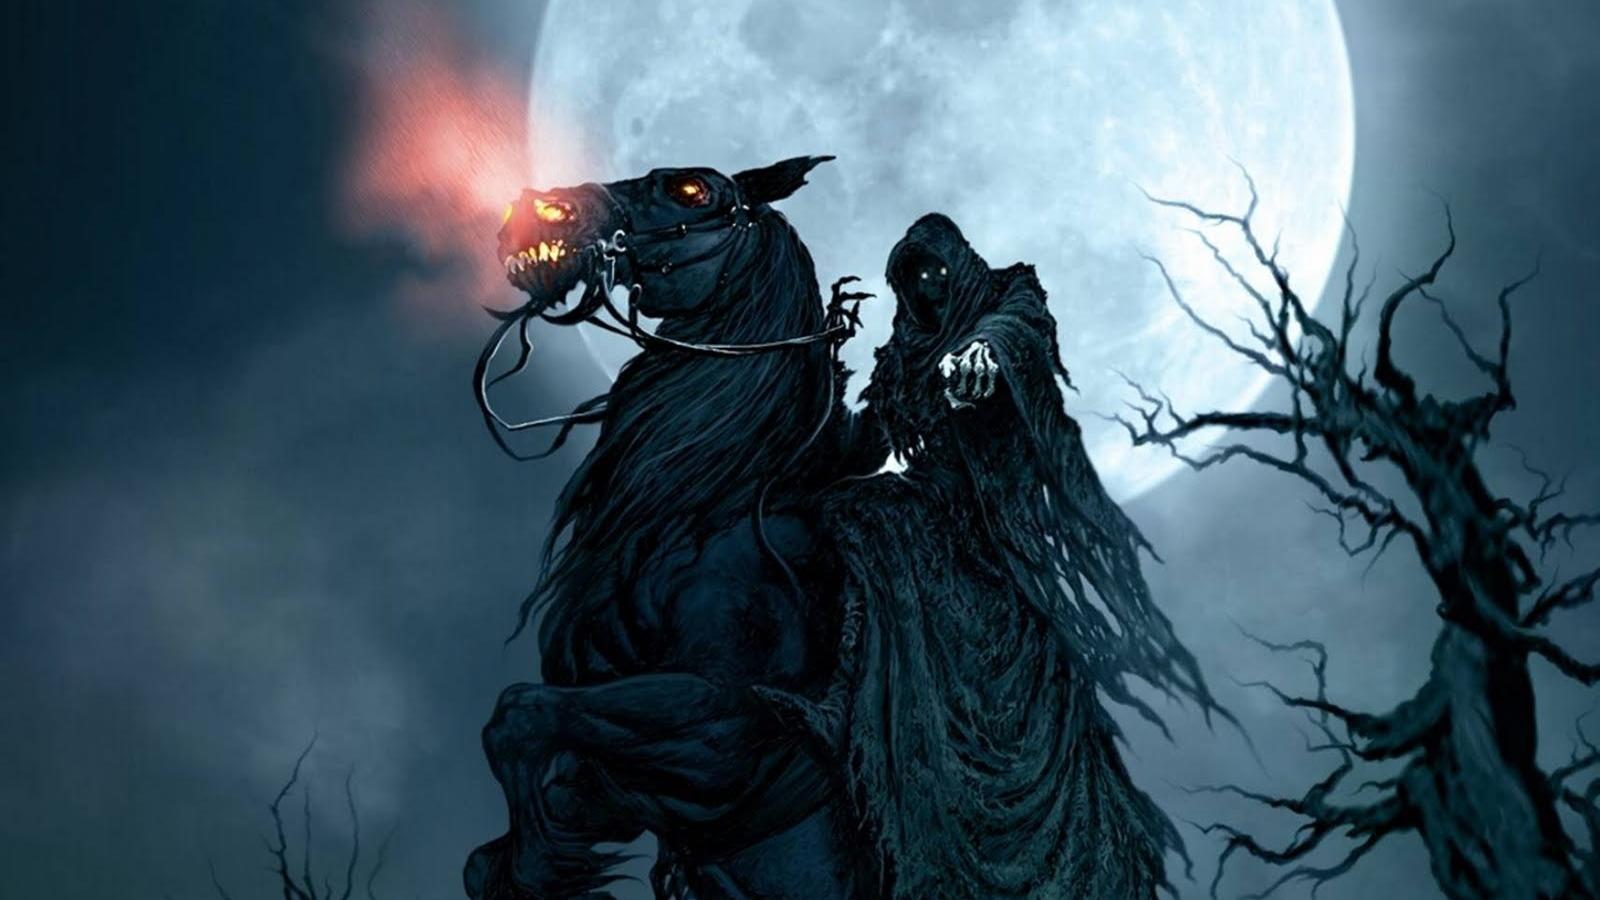 Free Download New Art Funny Wallpapers Jokes Dark Fantasy